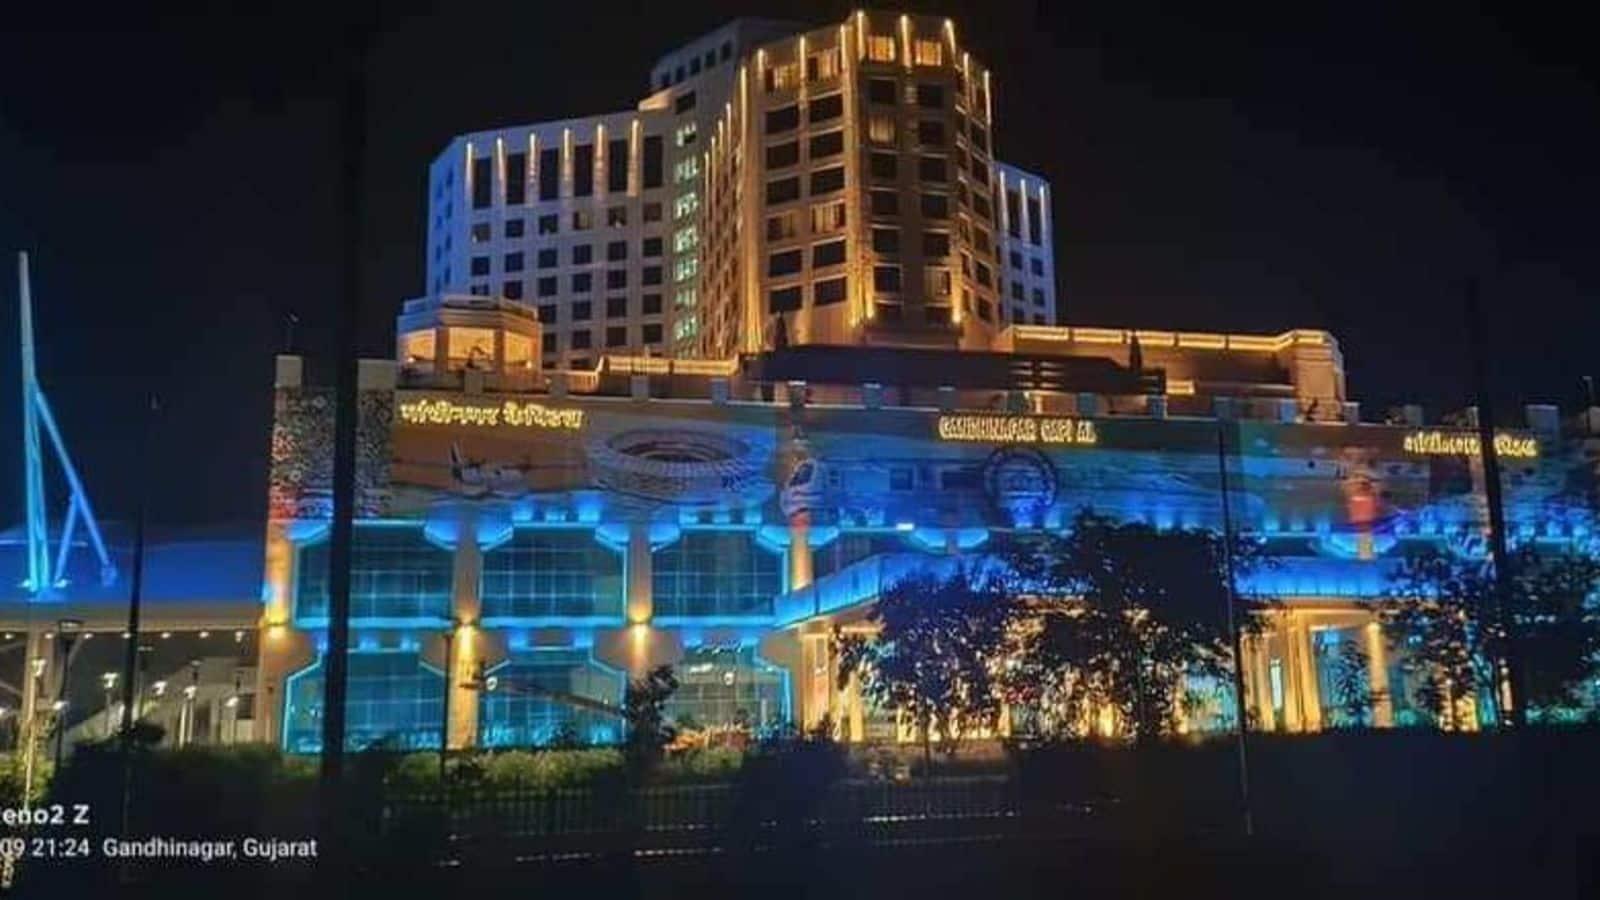 PM Modi to inaugurate 5-star hotel atop Gandhinagar train station on Friday